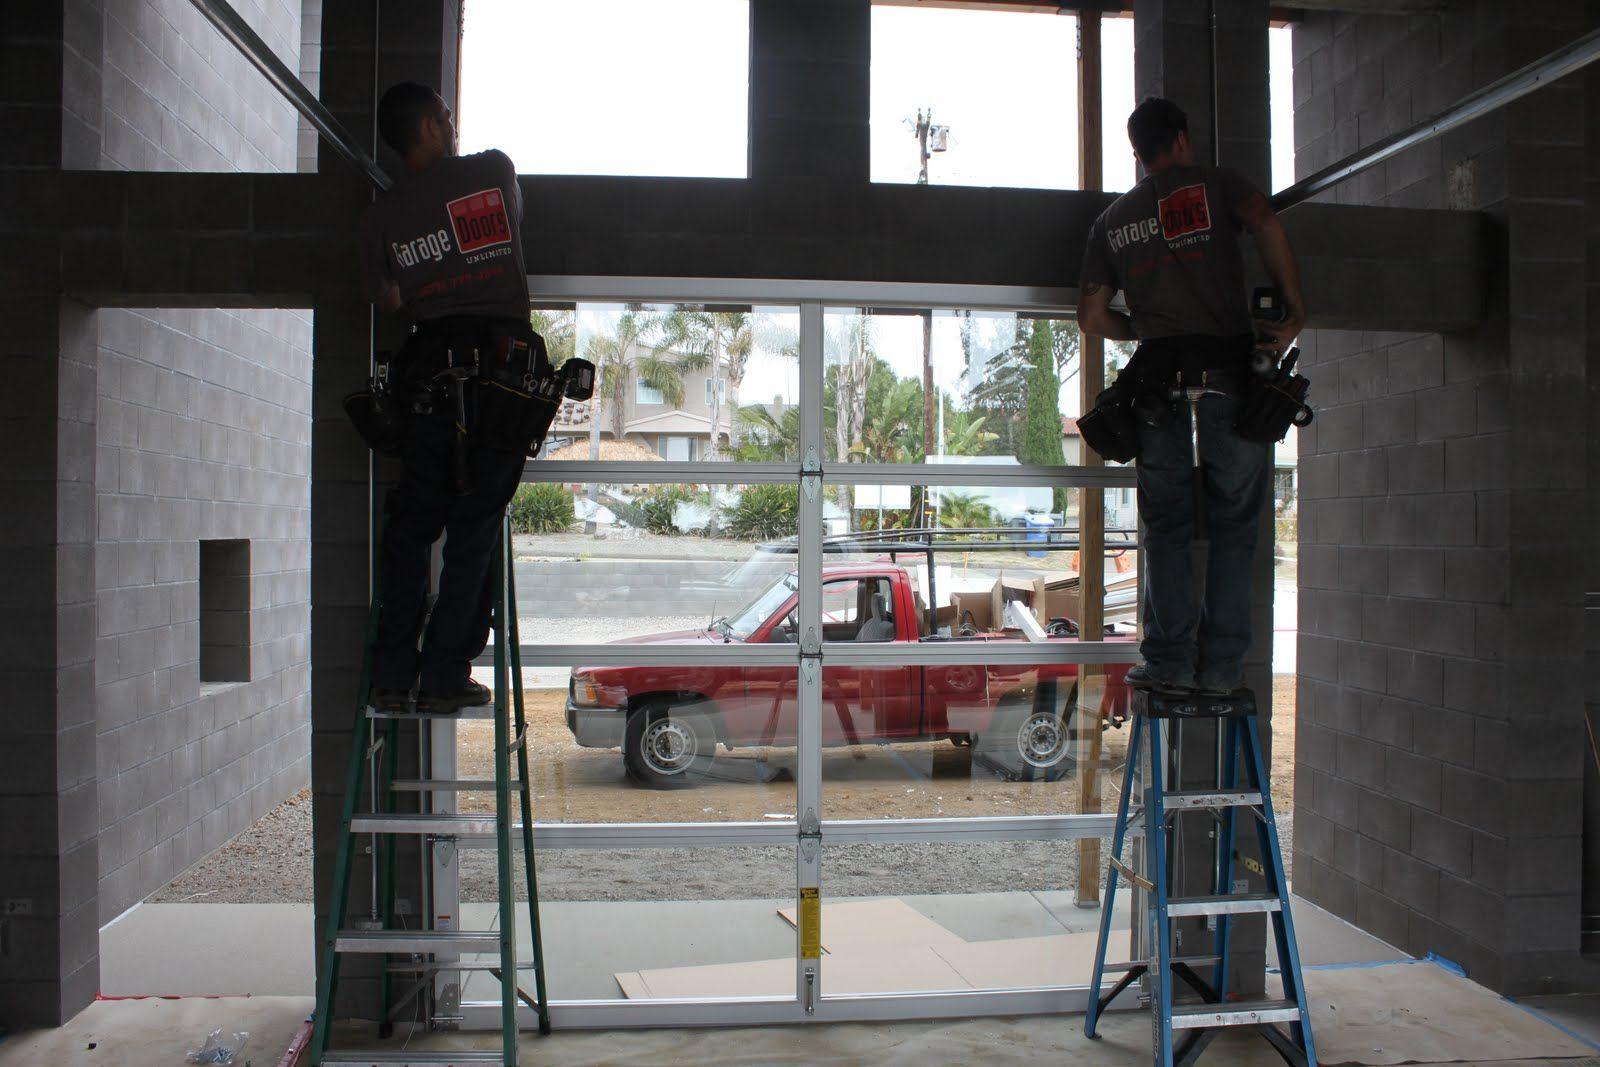 Wonderful Aluminum Full View Glass Garage Doors On Restaurant | Garage Doors Unlimited:  3u0027s A Crowd